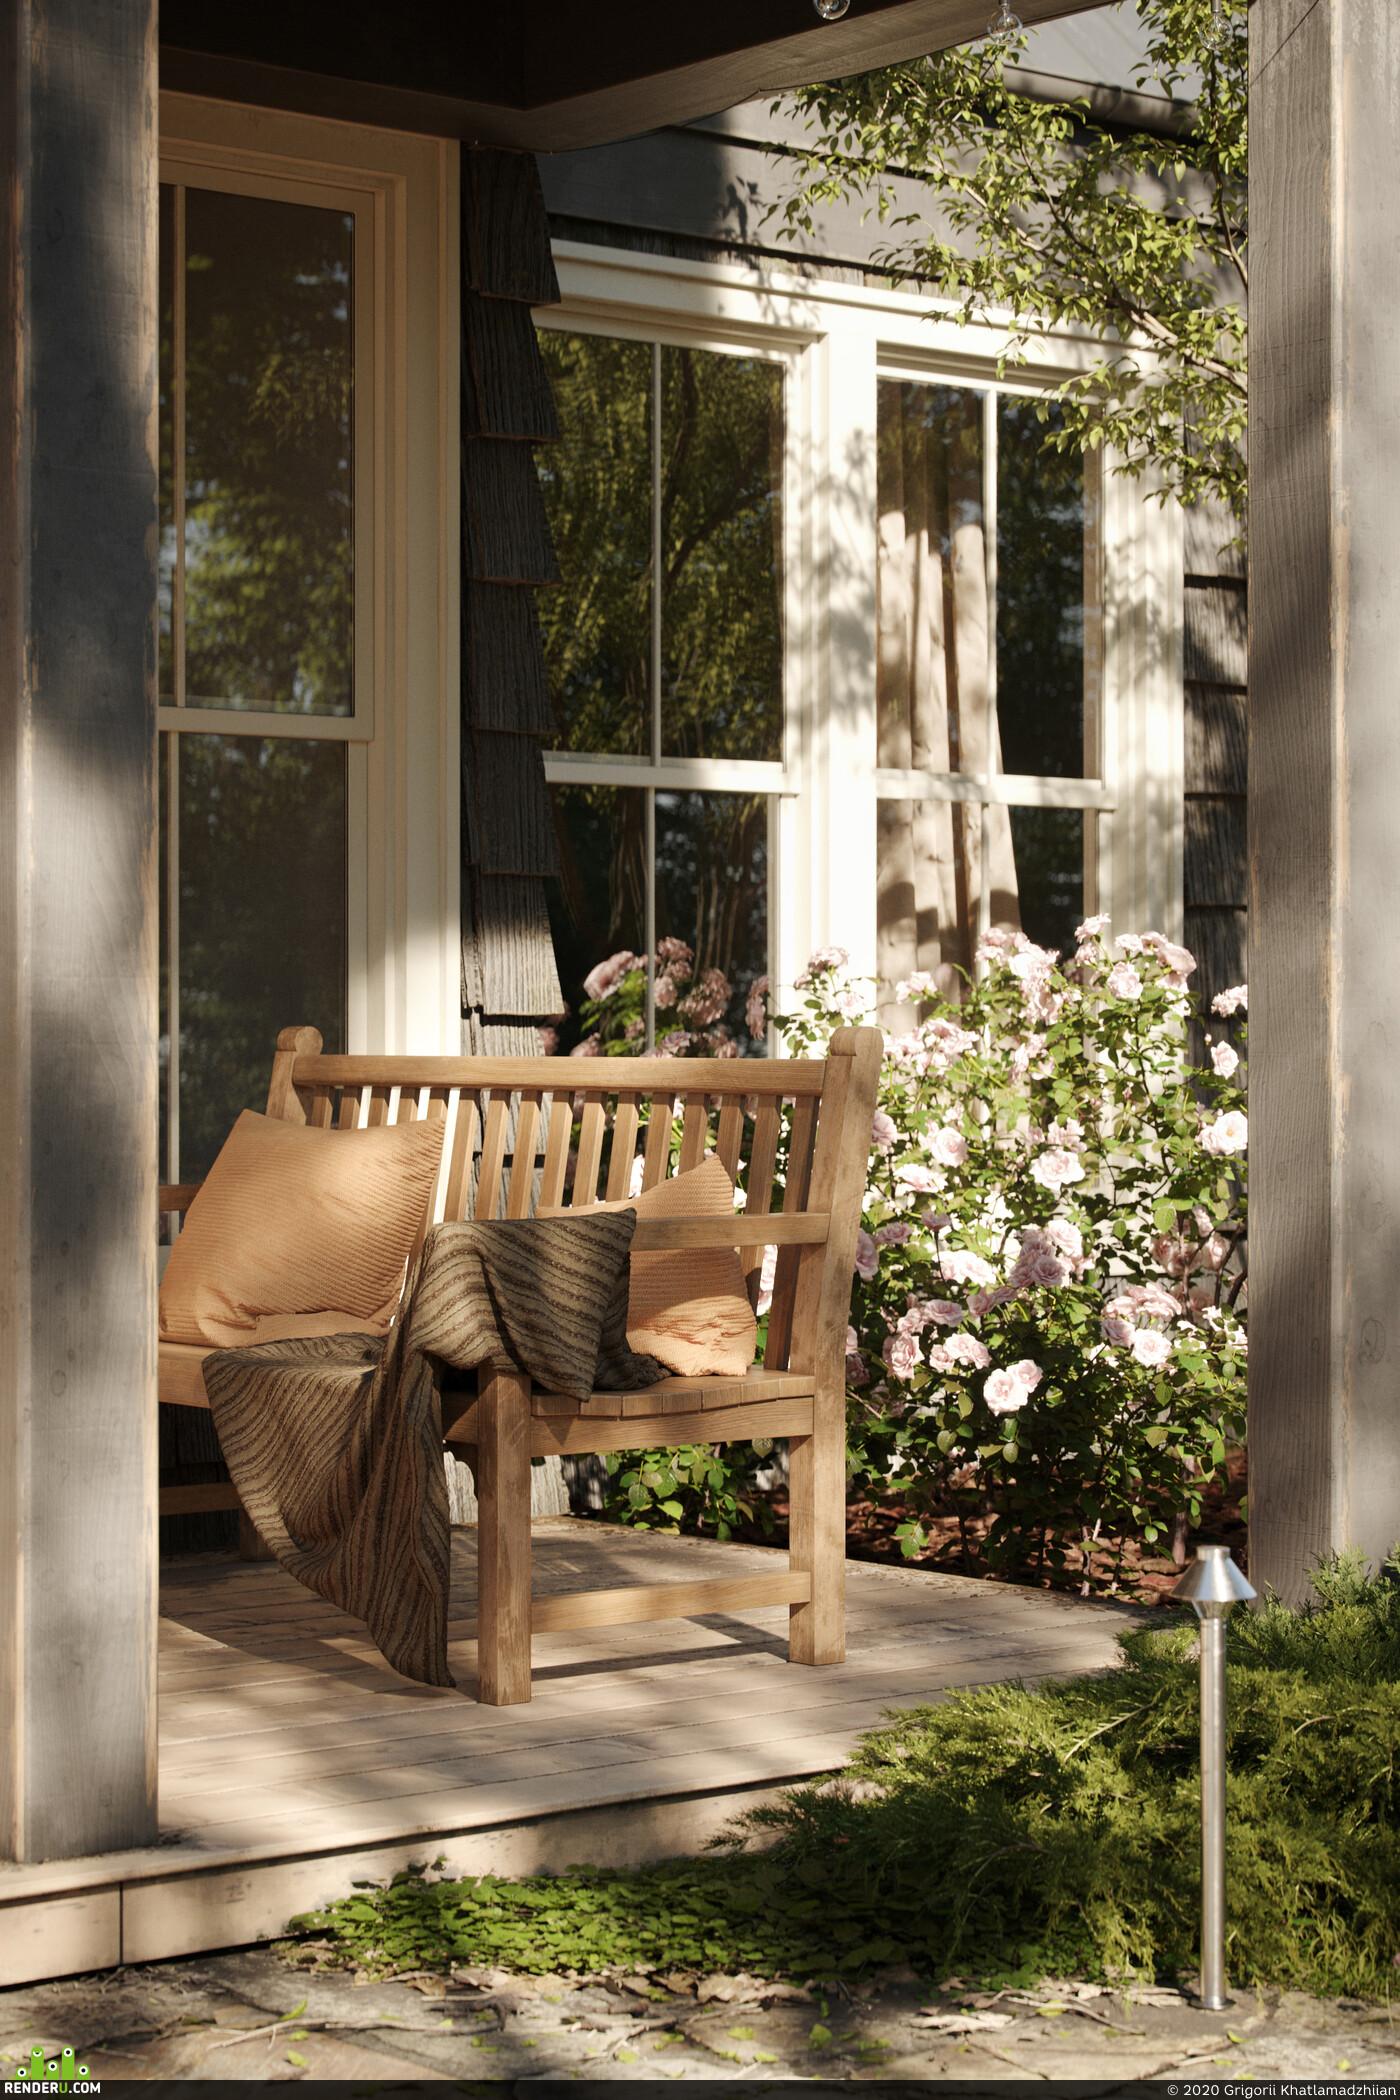 architecture, house in the forest, forest, garden, house, landscape, QuixelMegascans, coronarenderer, cgi